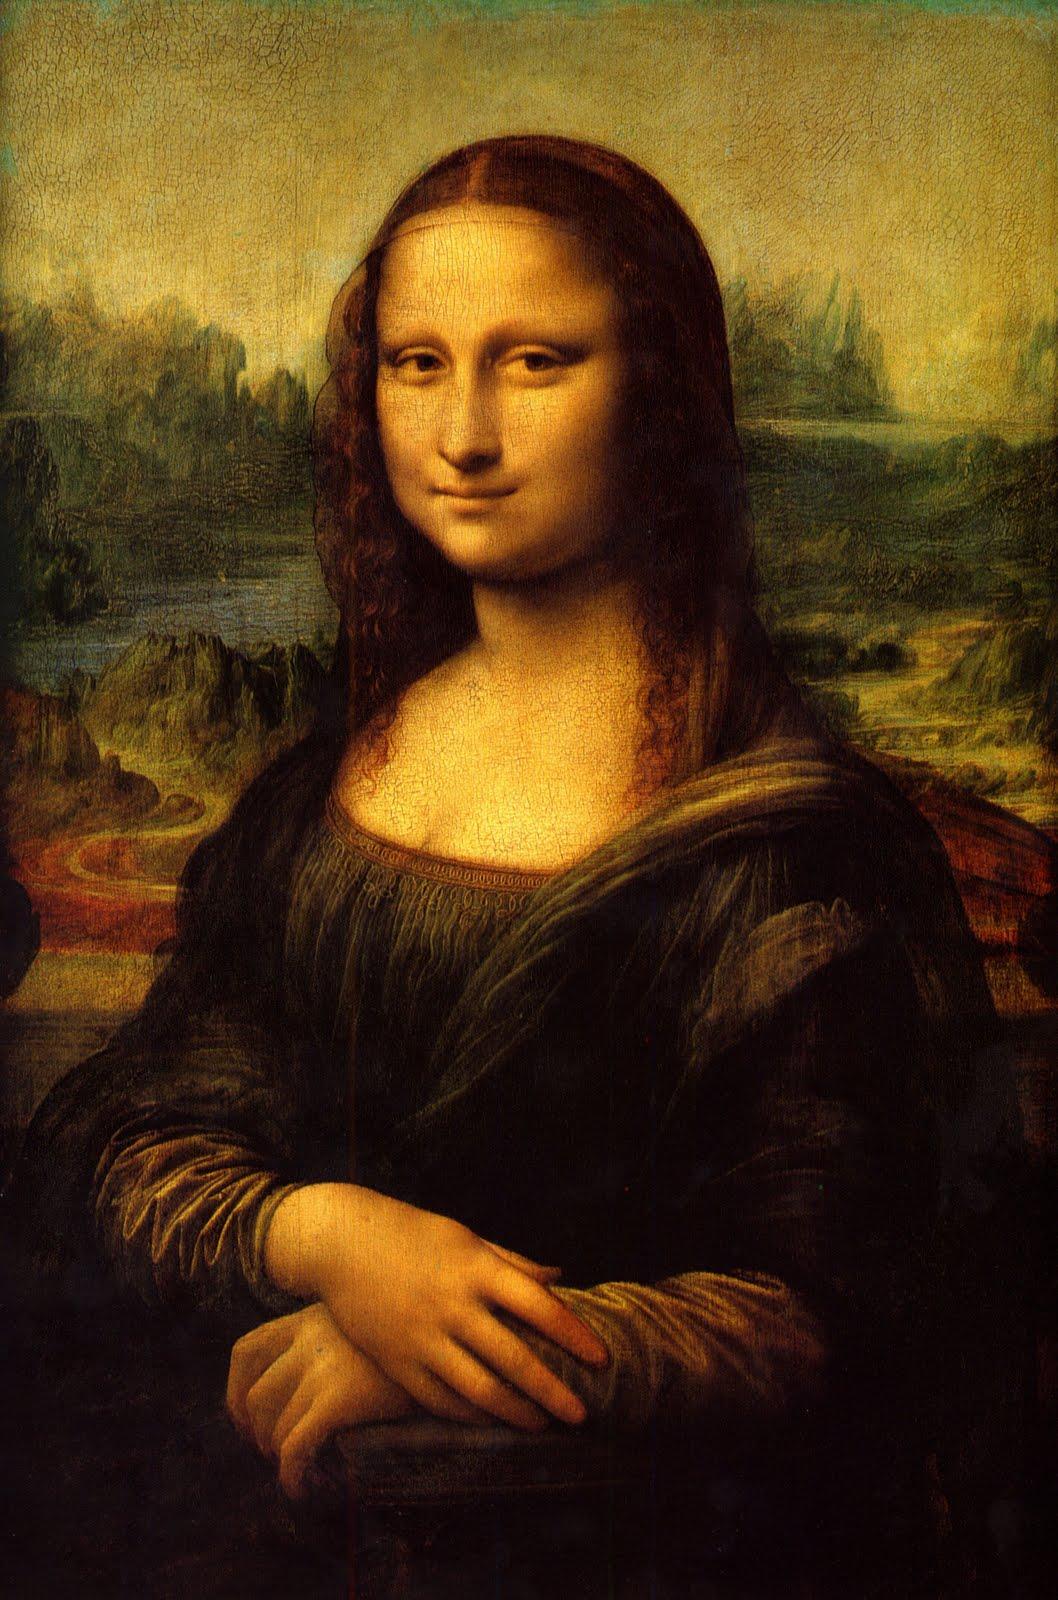 LA JOCONDE - 1503/06 - Léonard de Vinci